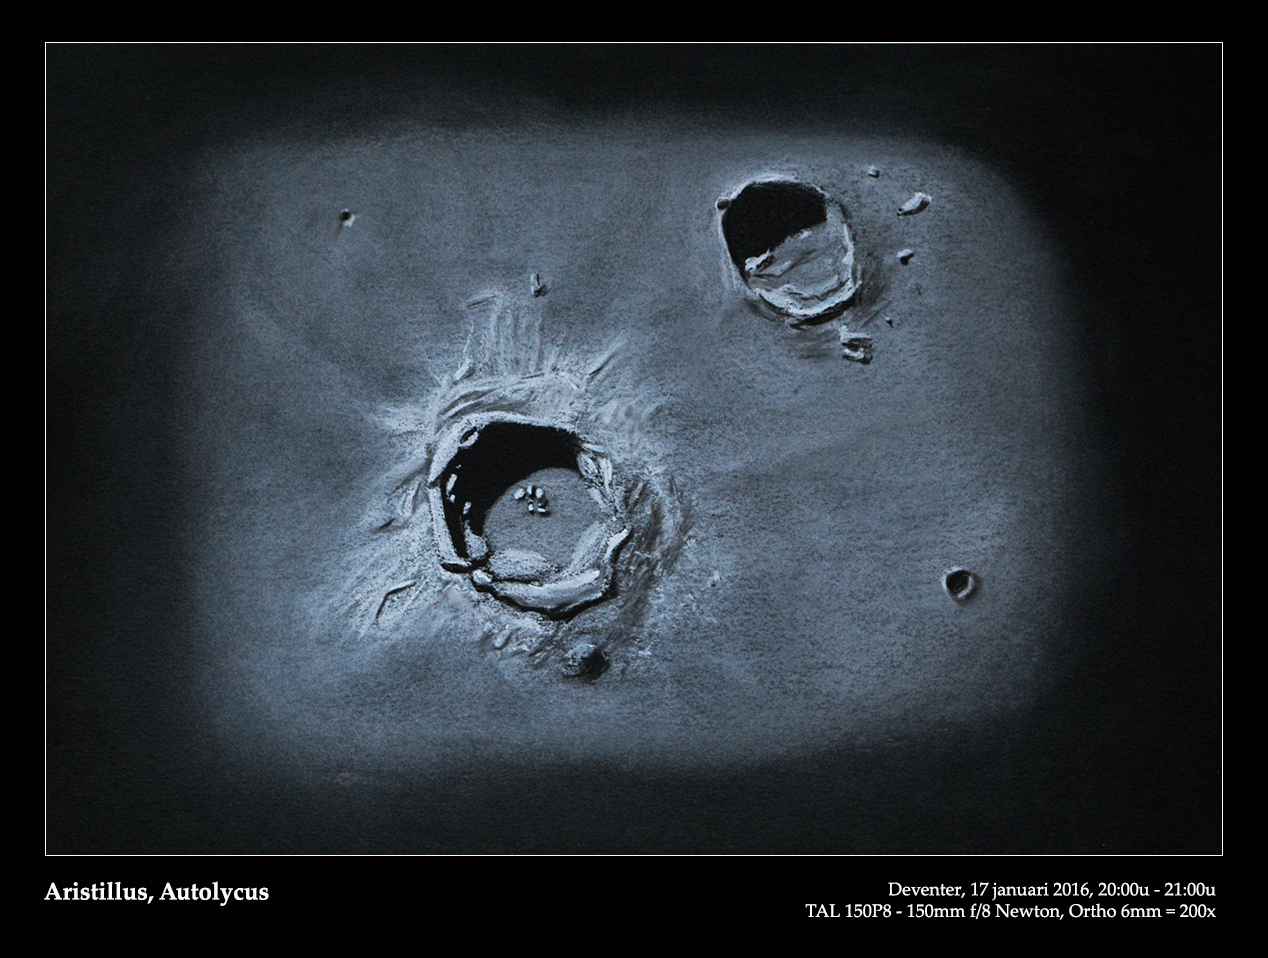 Schets_Aristillus_Autolycus_20160118_groot